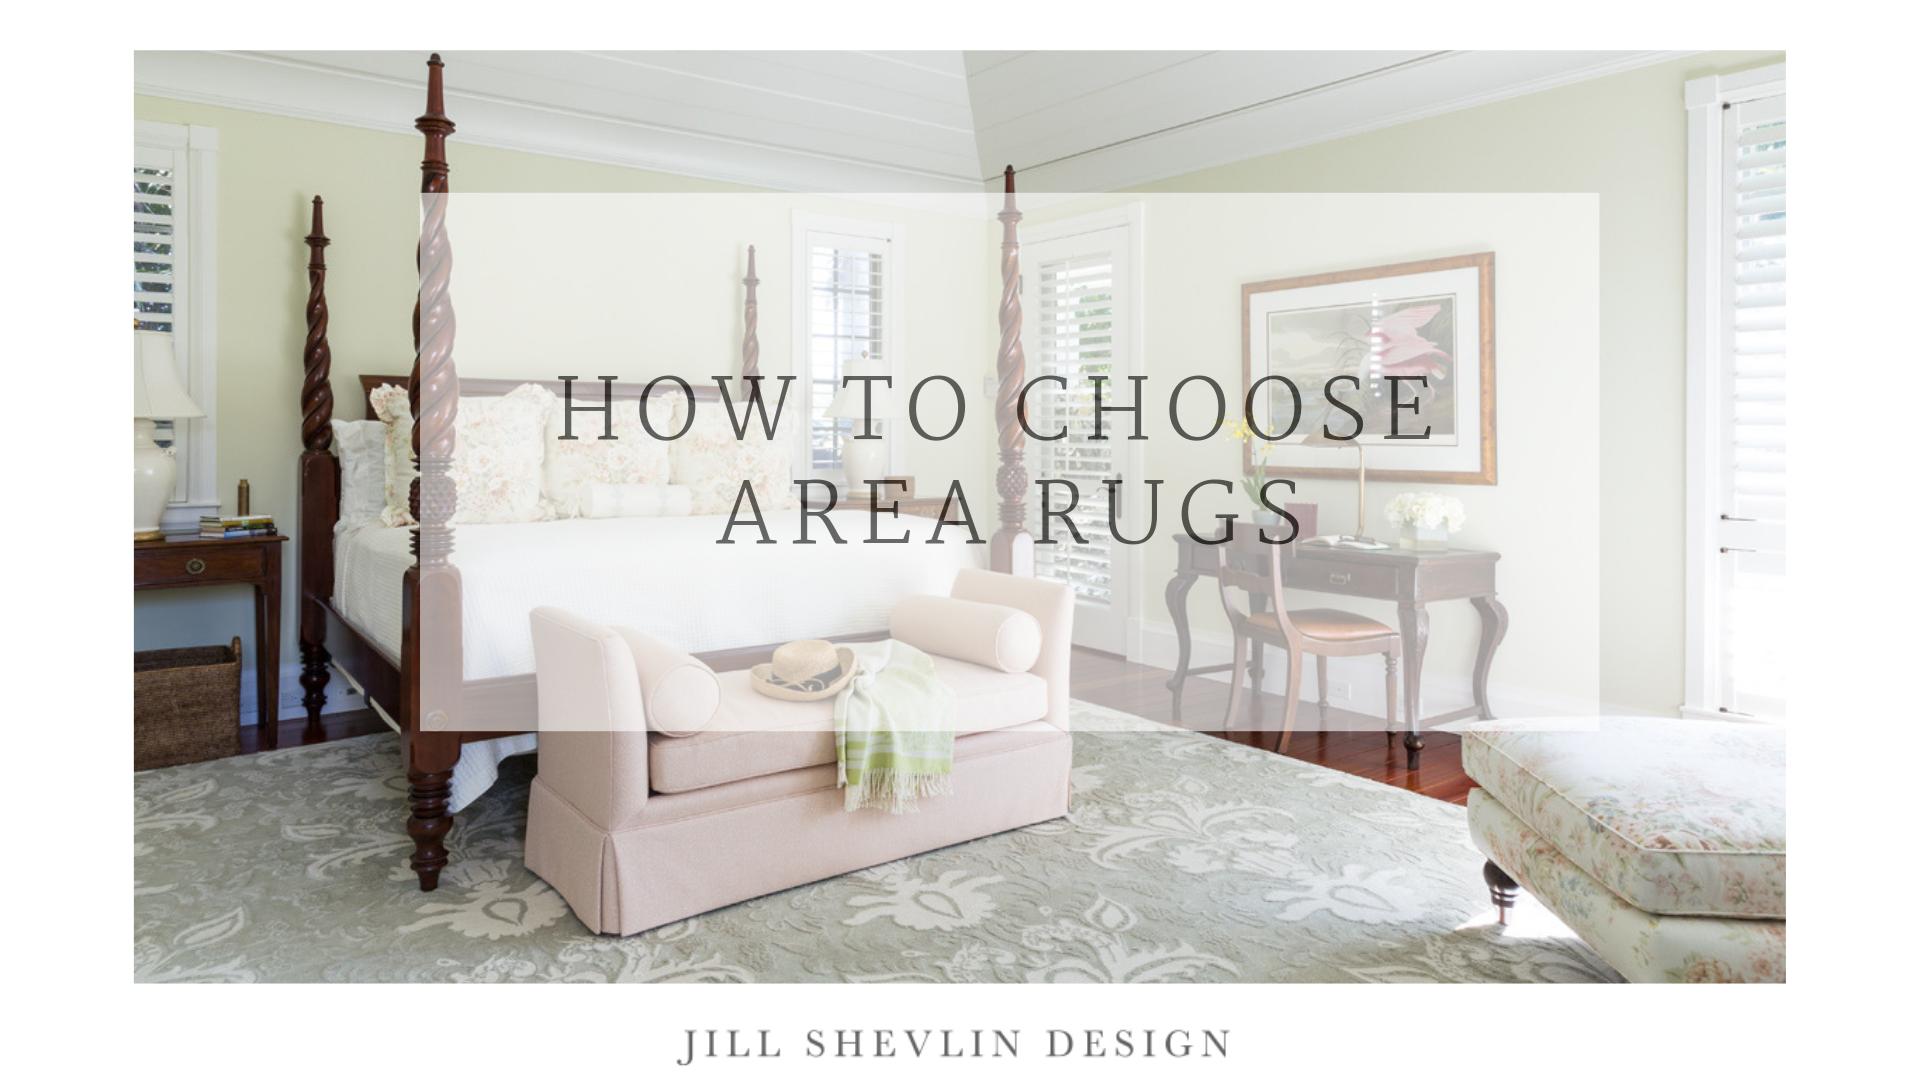 Custom Wool How to Choose and Area Rug Shevlin Design Vero Beach Interior Designer Vero Beach Home Decor, Vero Beach Home Decorate